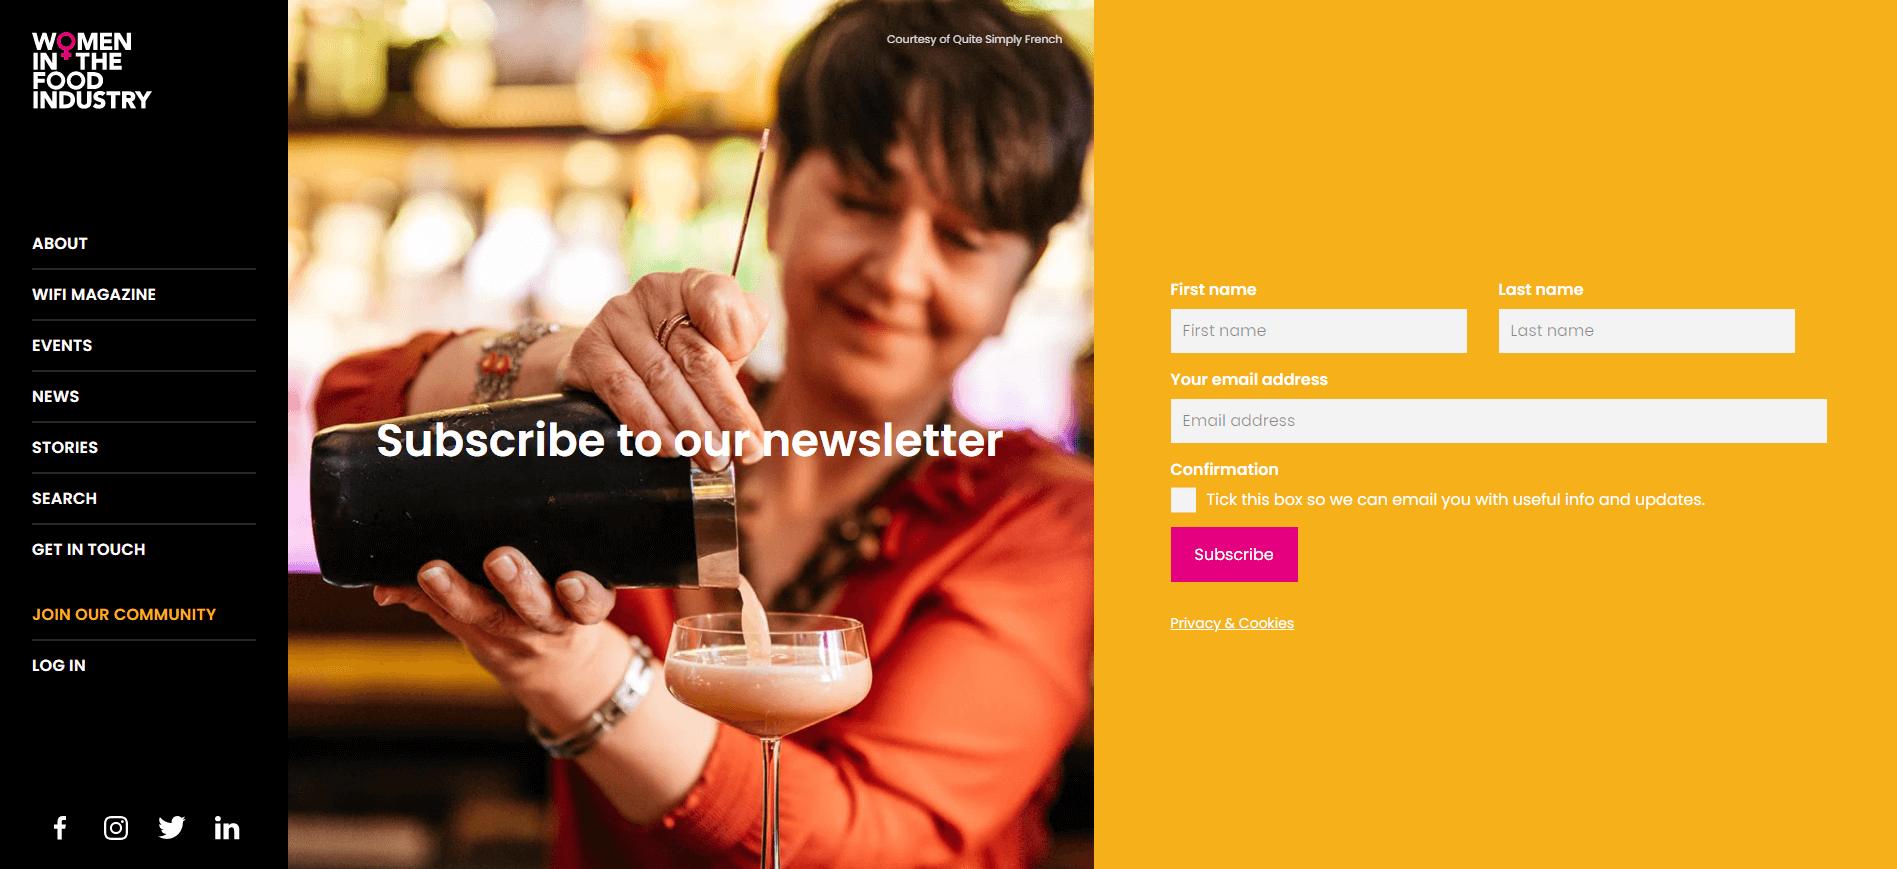 women in the food industry newsletter